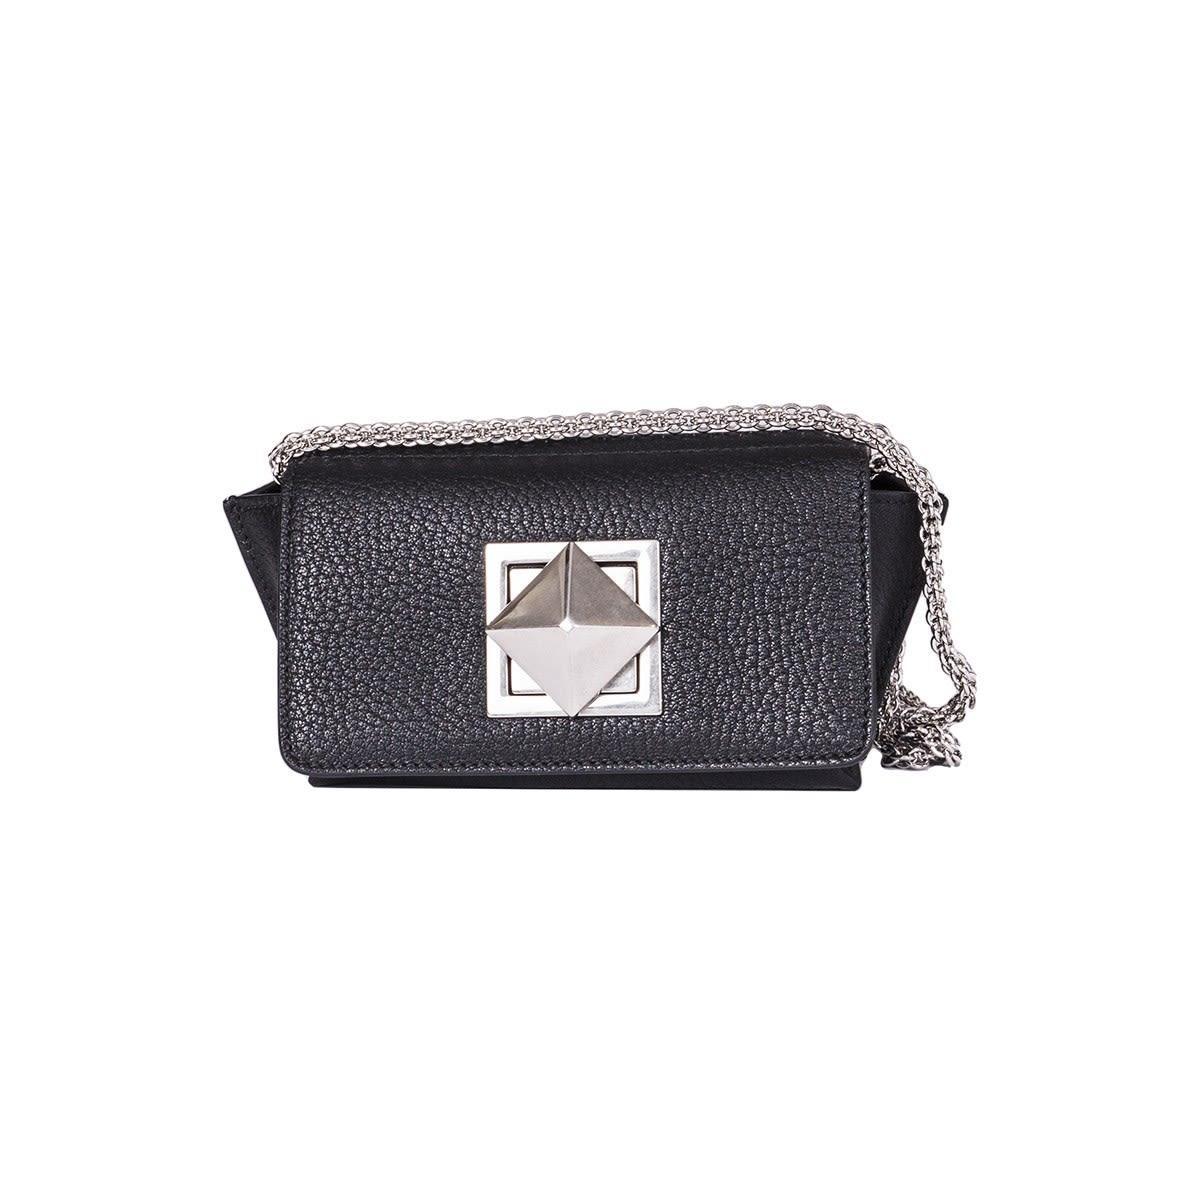 Sonia Rykiel Le Copain Shoulder Bag In Black